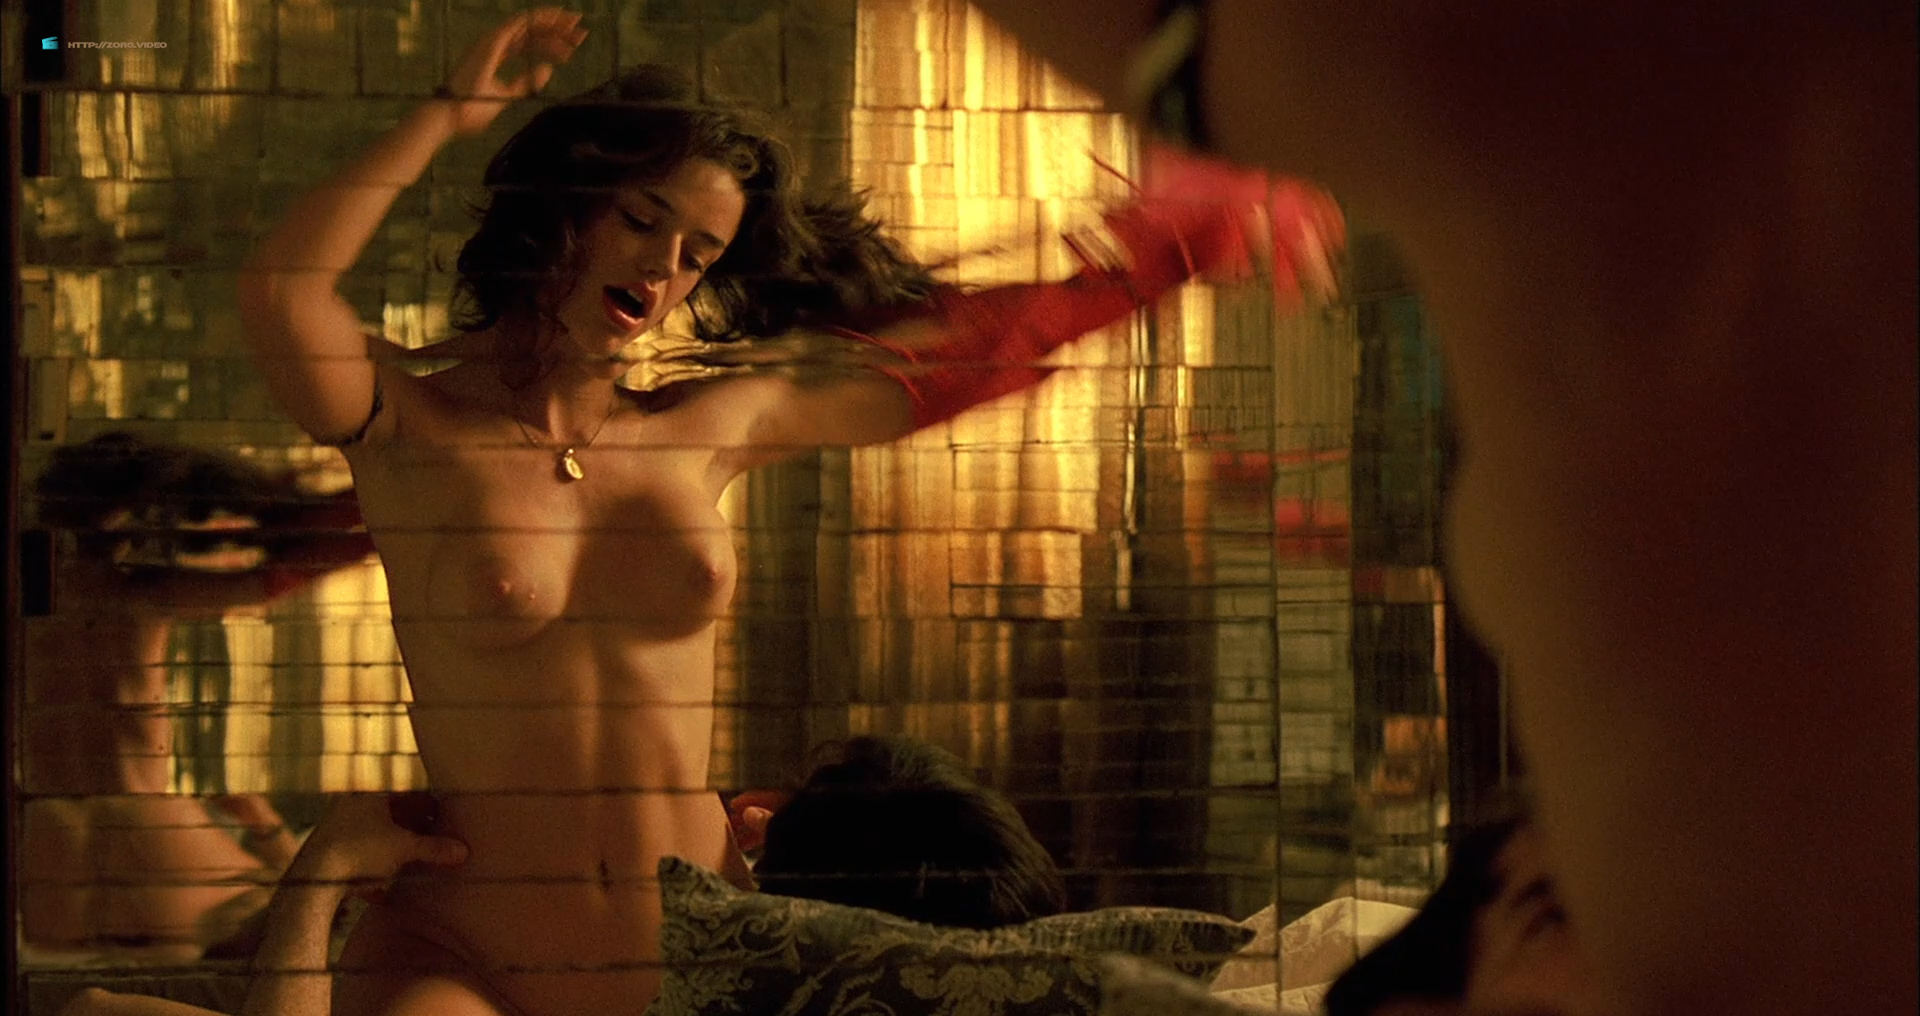 Flora Martinez nude and lot of sex - Rosario Tijeras (2005) HD 1080p BluRay (7)